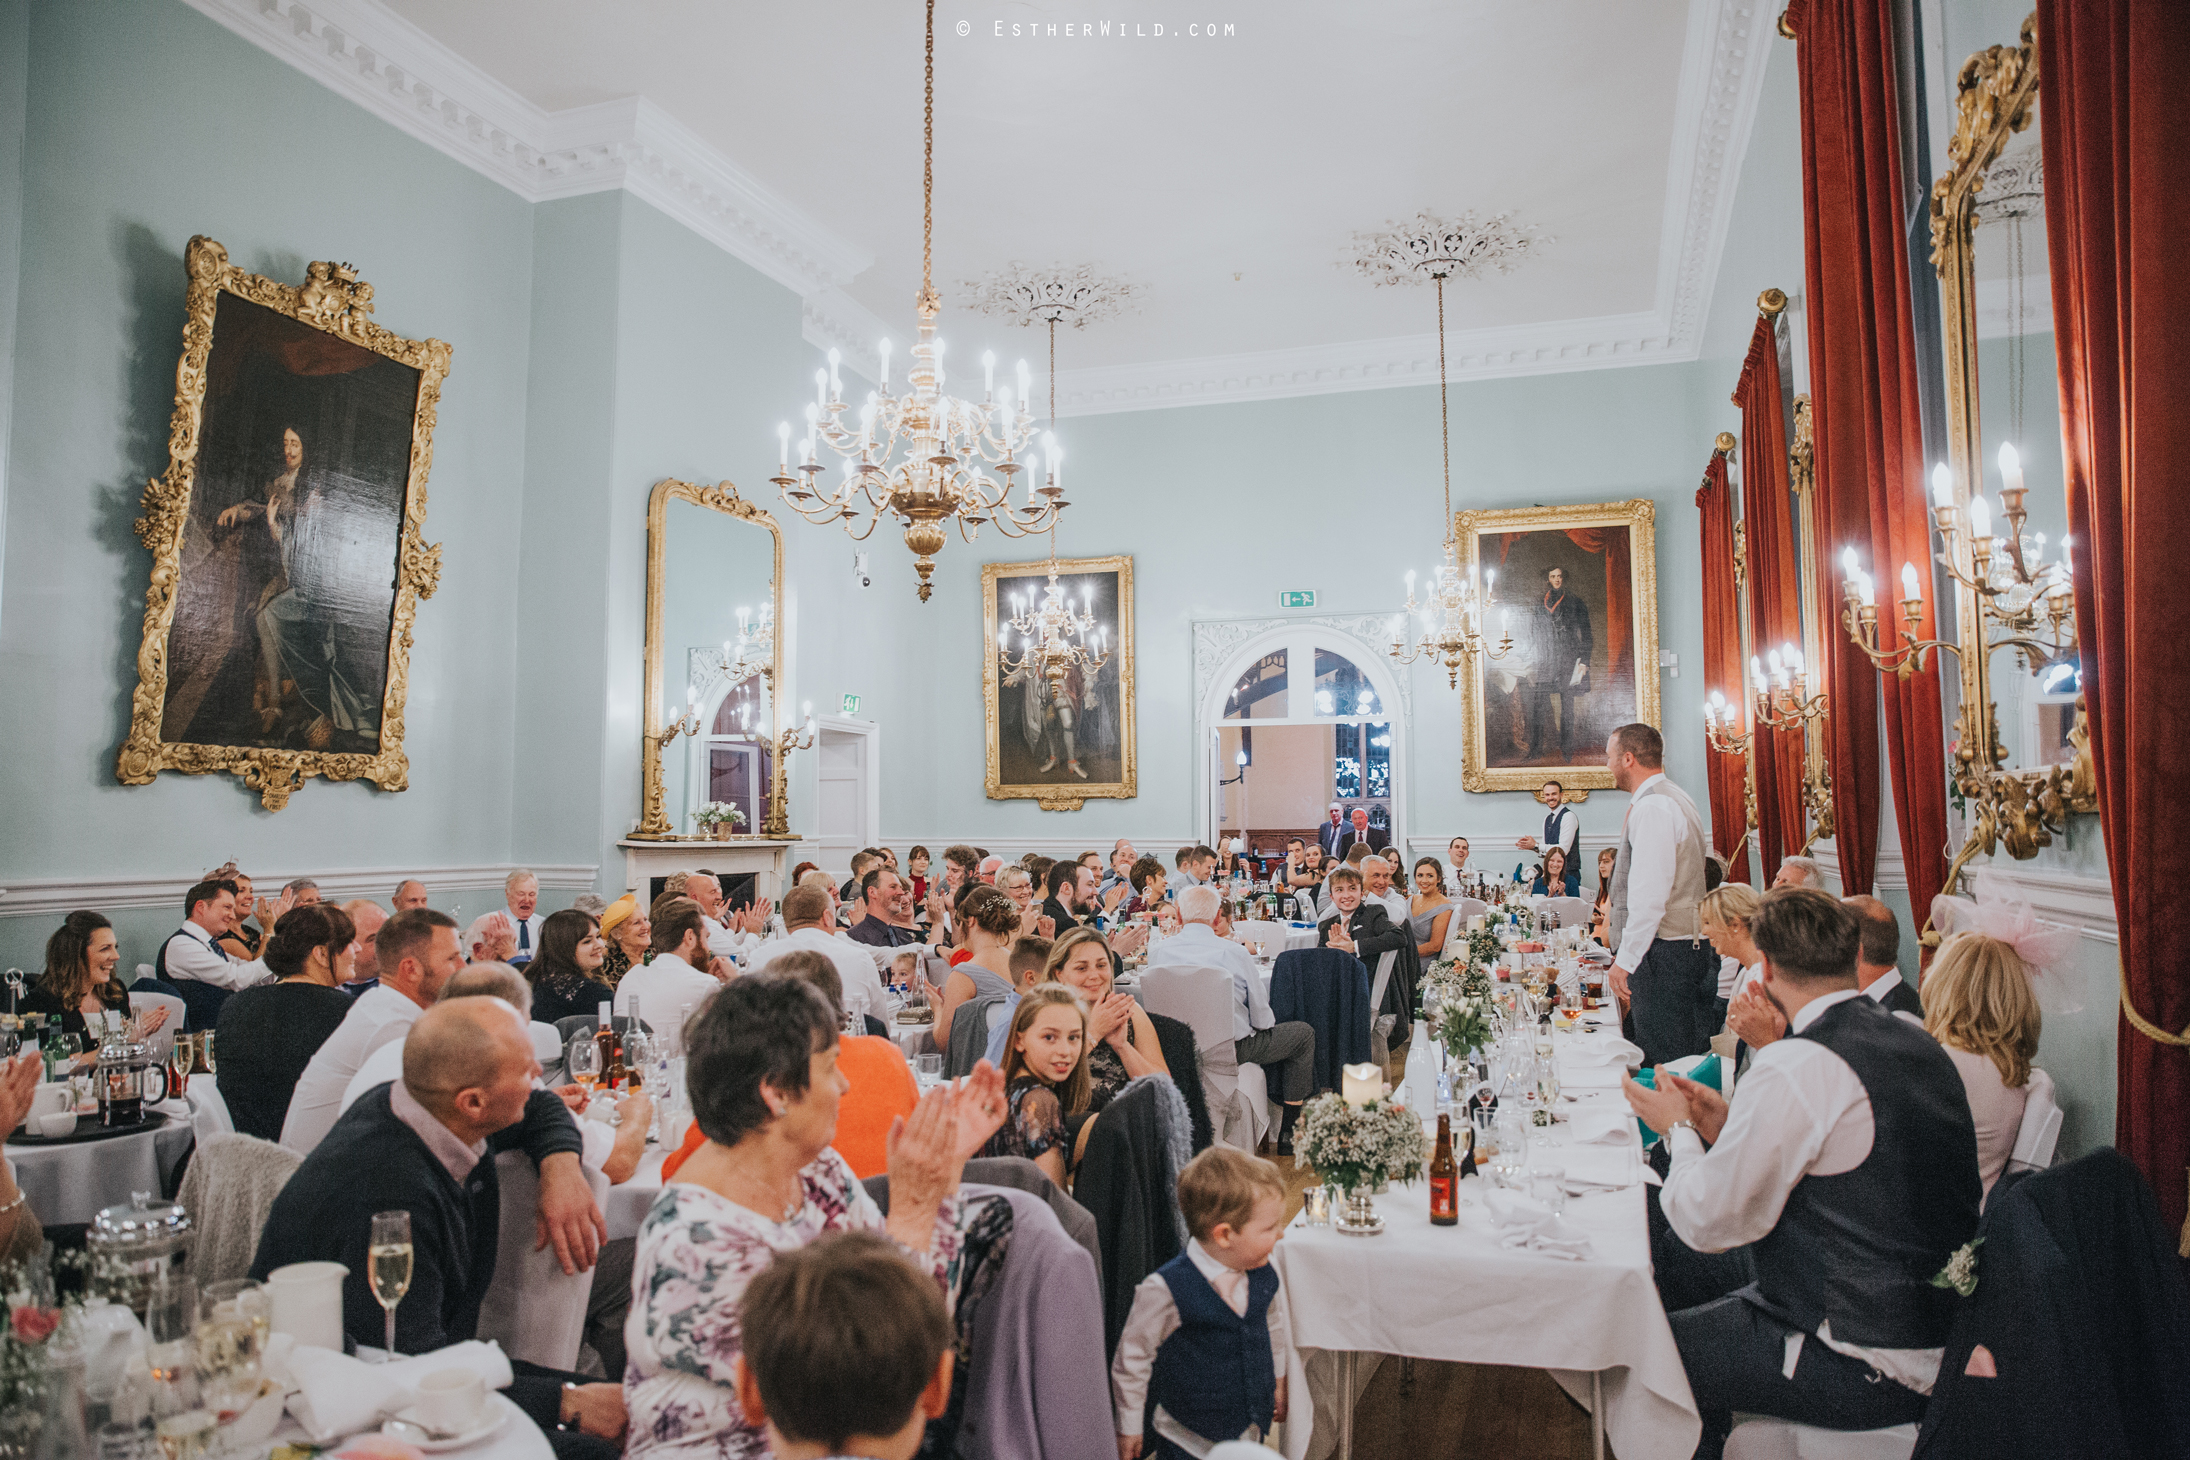 Wedding_Kings_Lynn_Town_Hall_Norfolk_Photographer_Esther_Wild_IMG_1687_IMGL0565.jpg